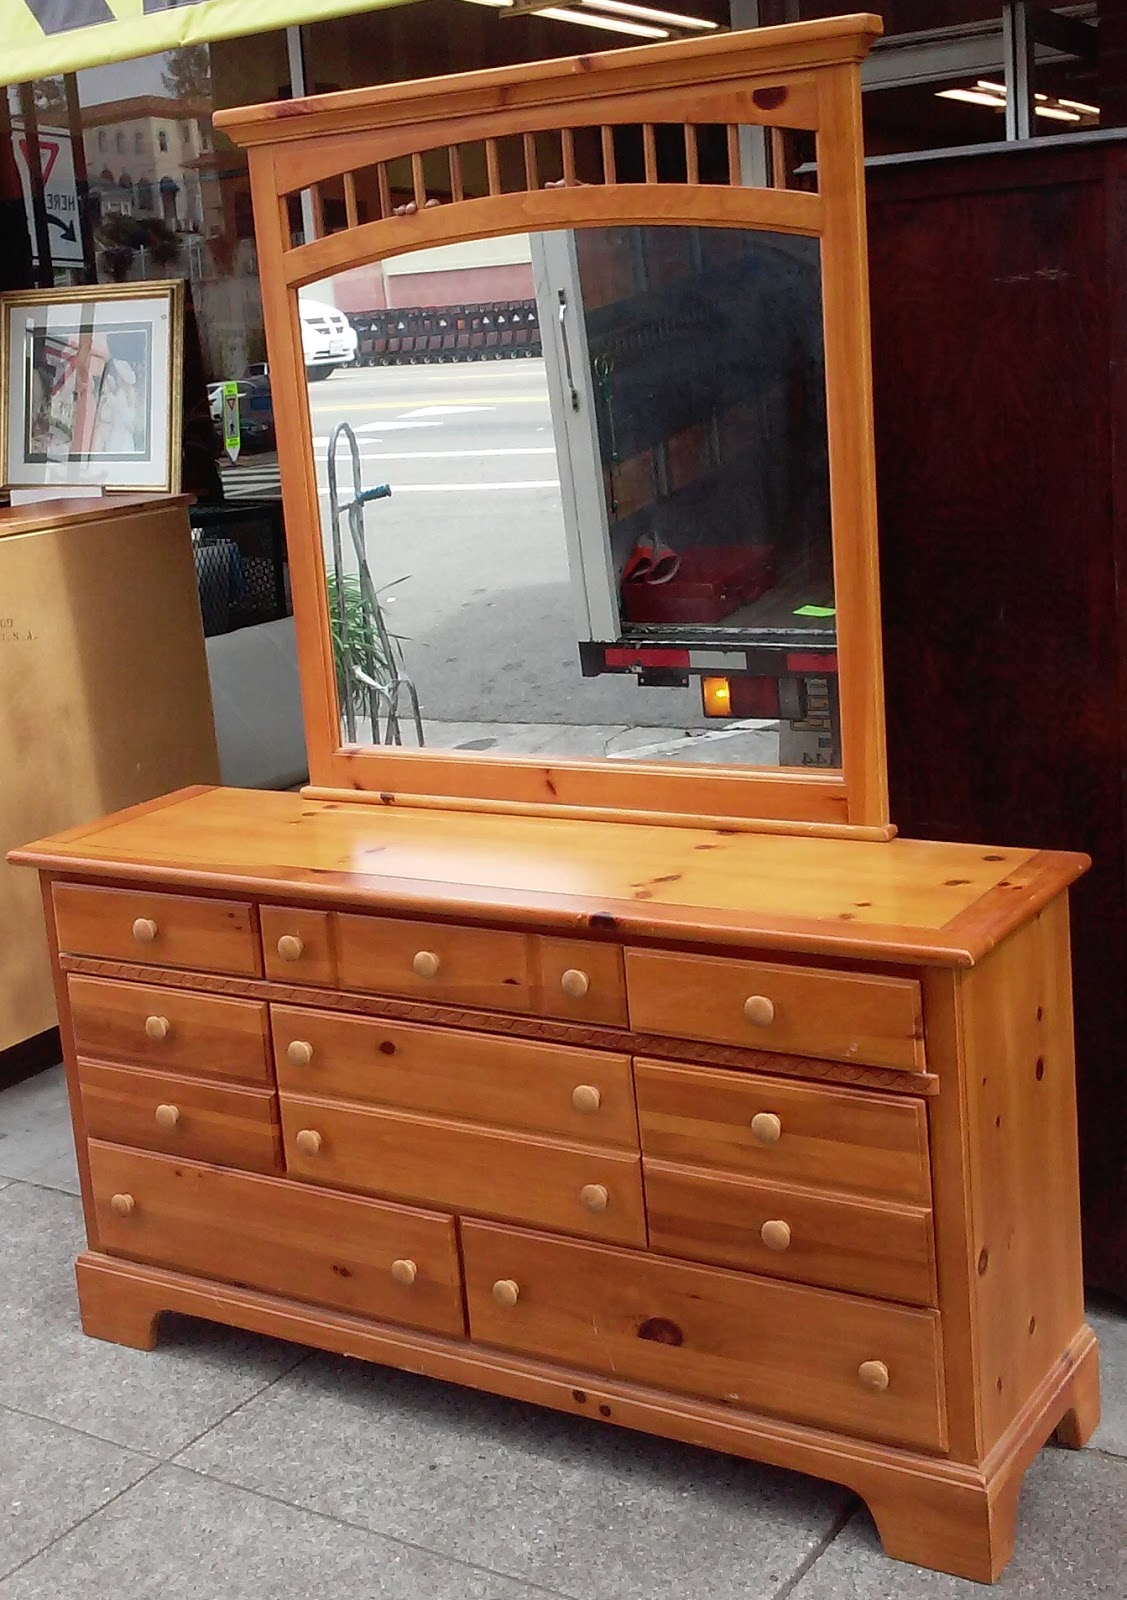 Uhuru Furniture Collectibles Sold Vaughan Furniture 5 1 2 39 Wide Honey Pine Dresser With